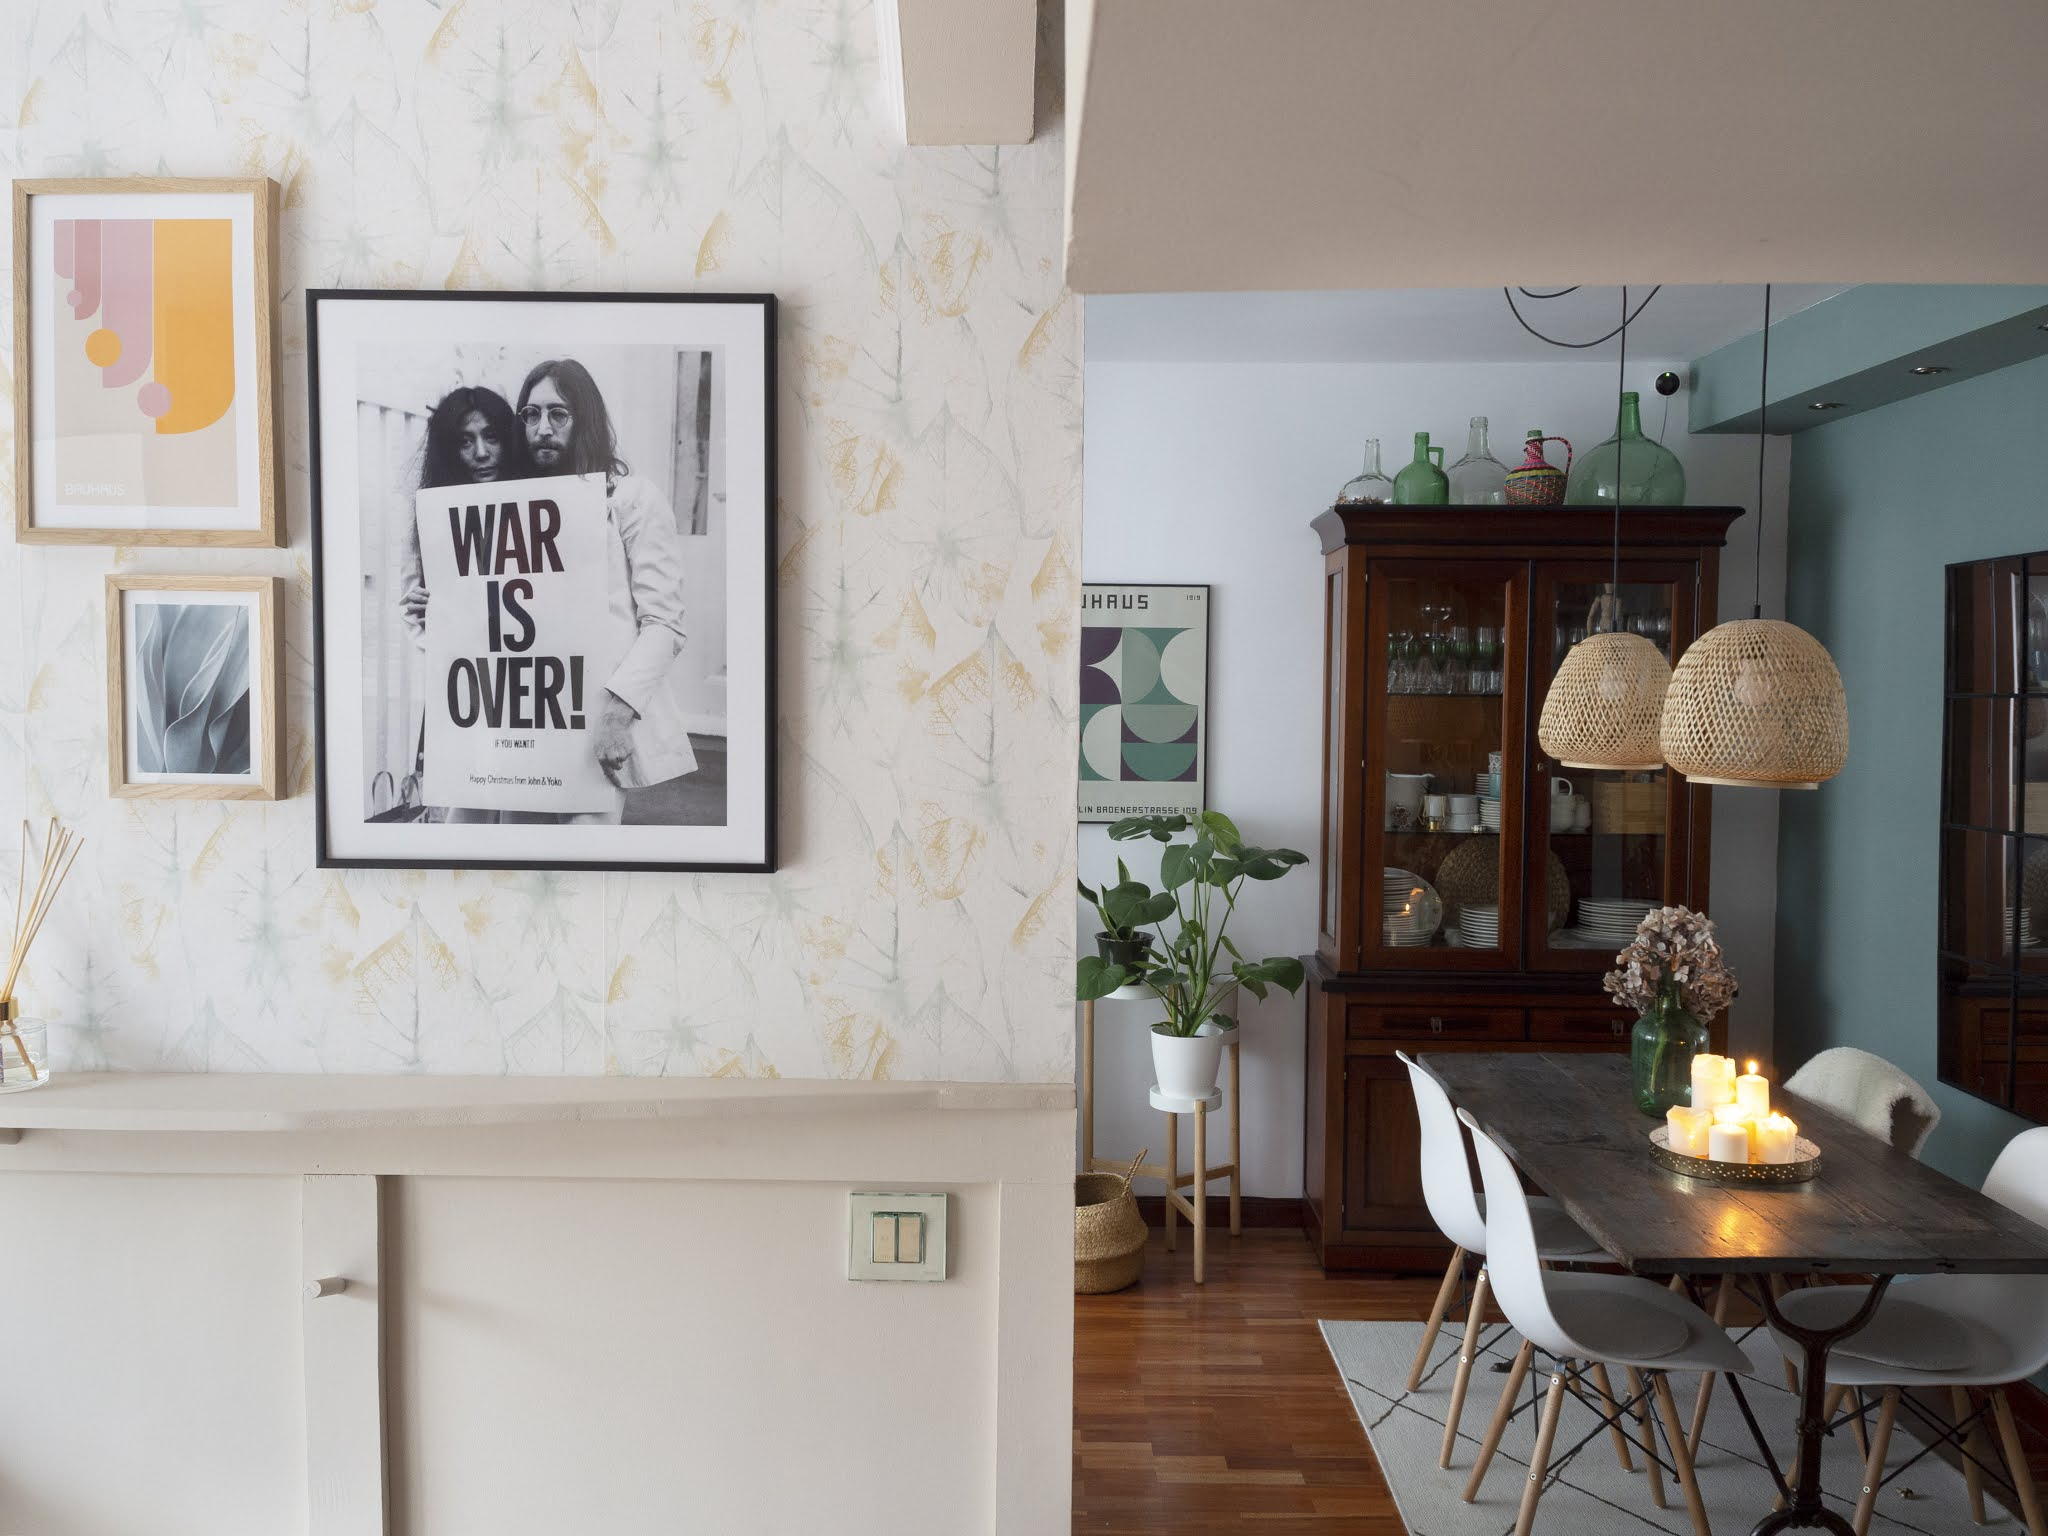 4 trucos para decorar de forma coherente vuestro hogar_7